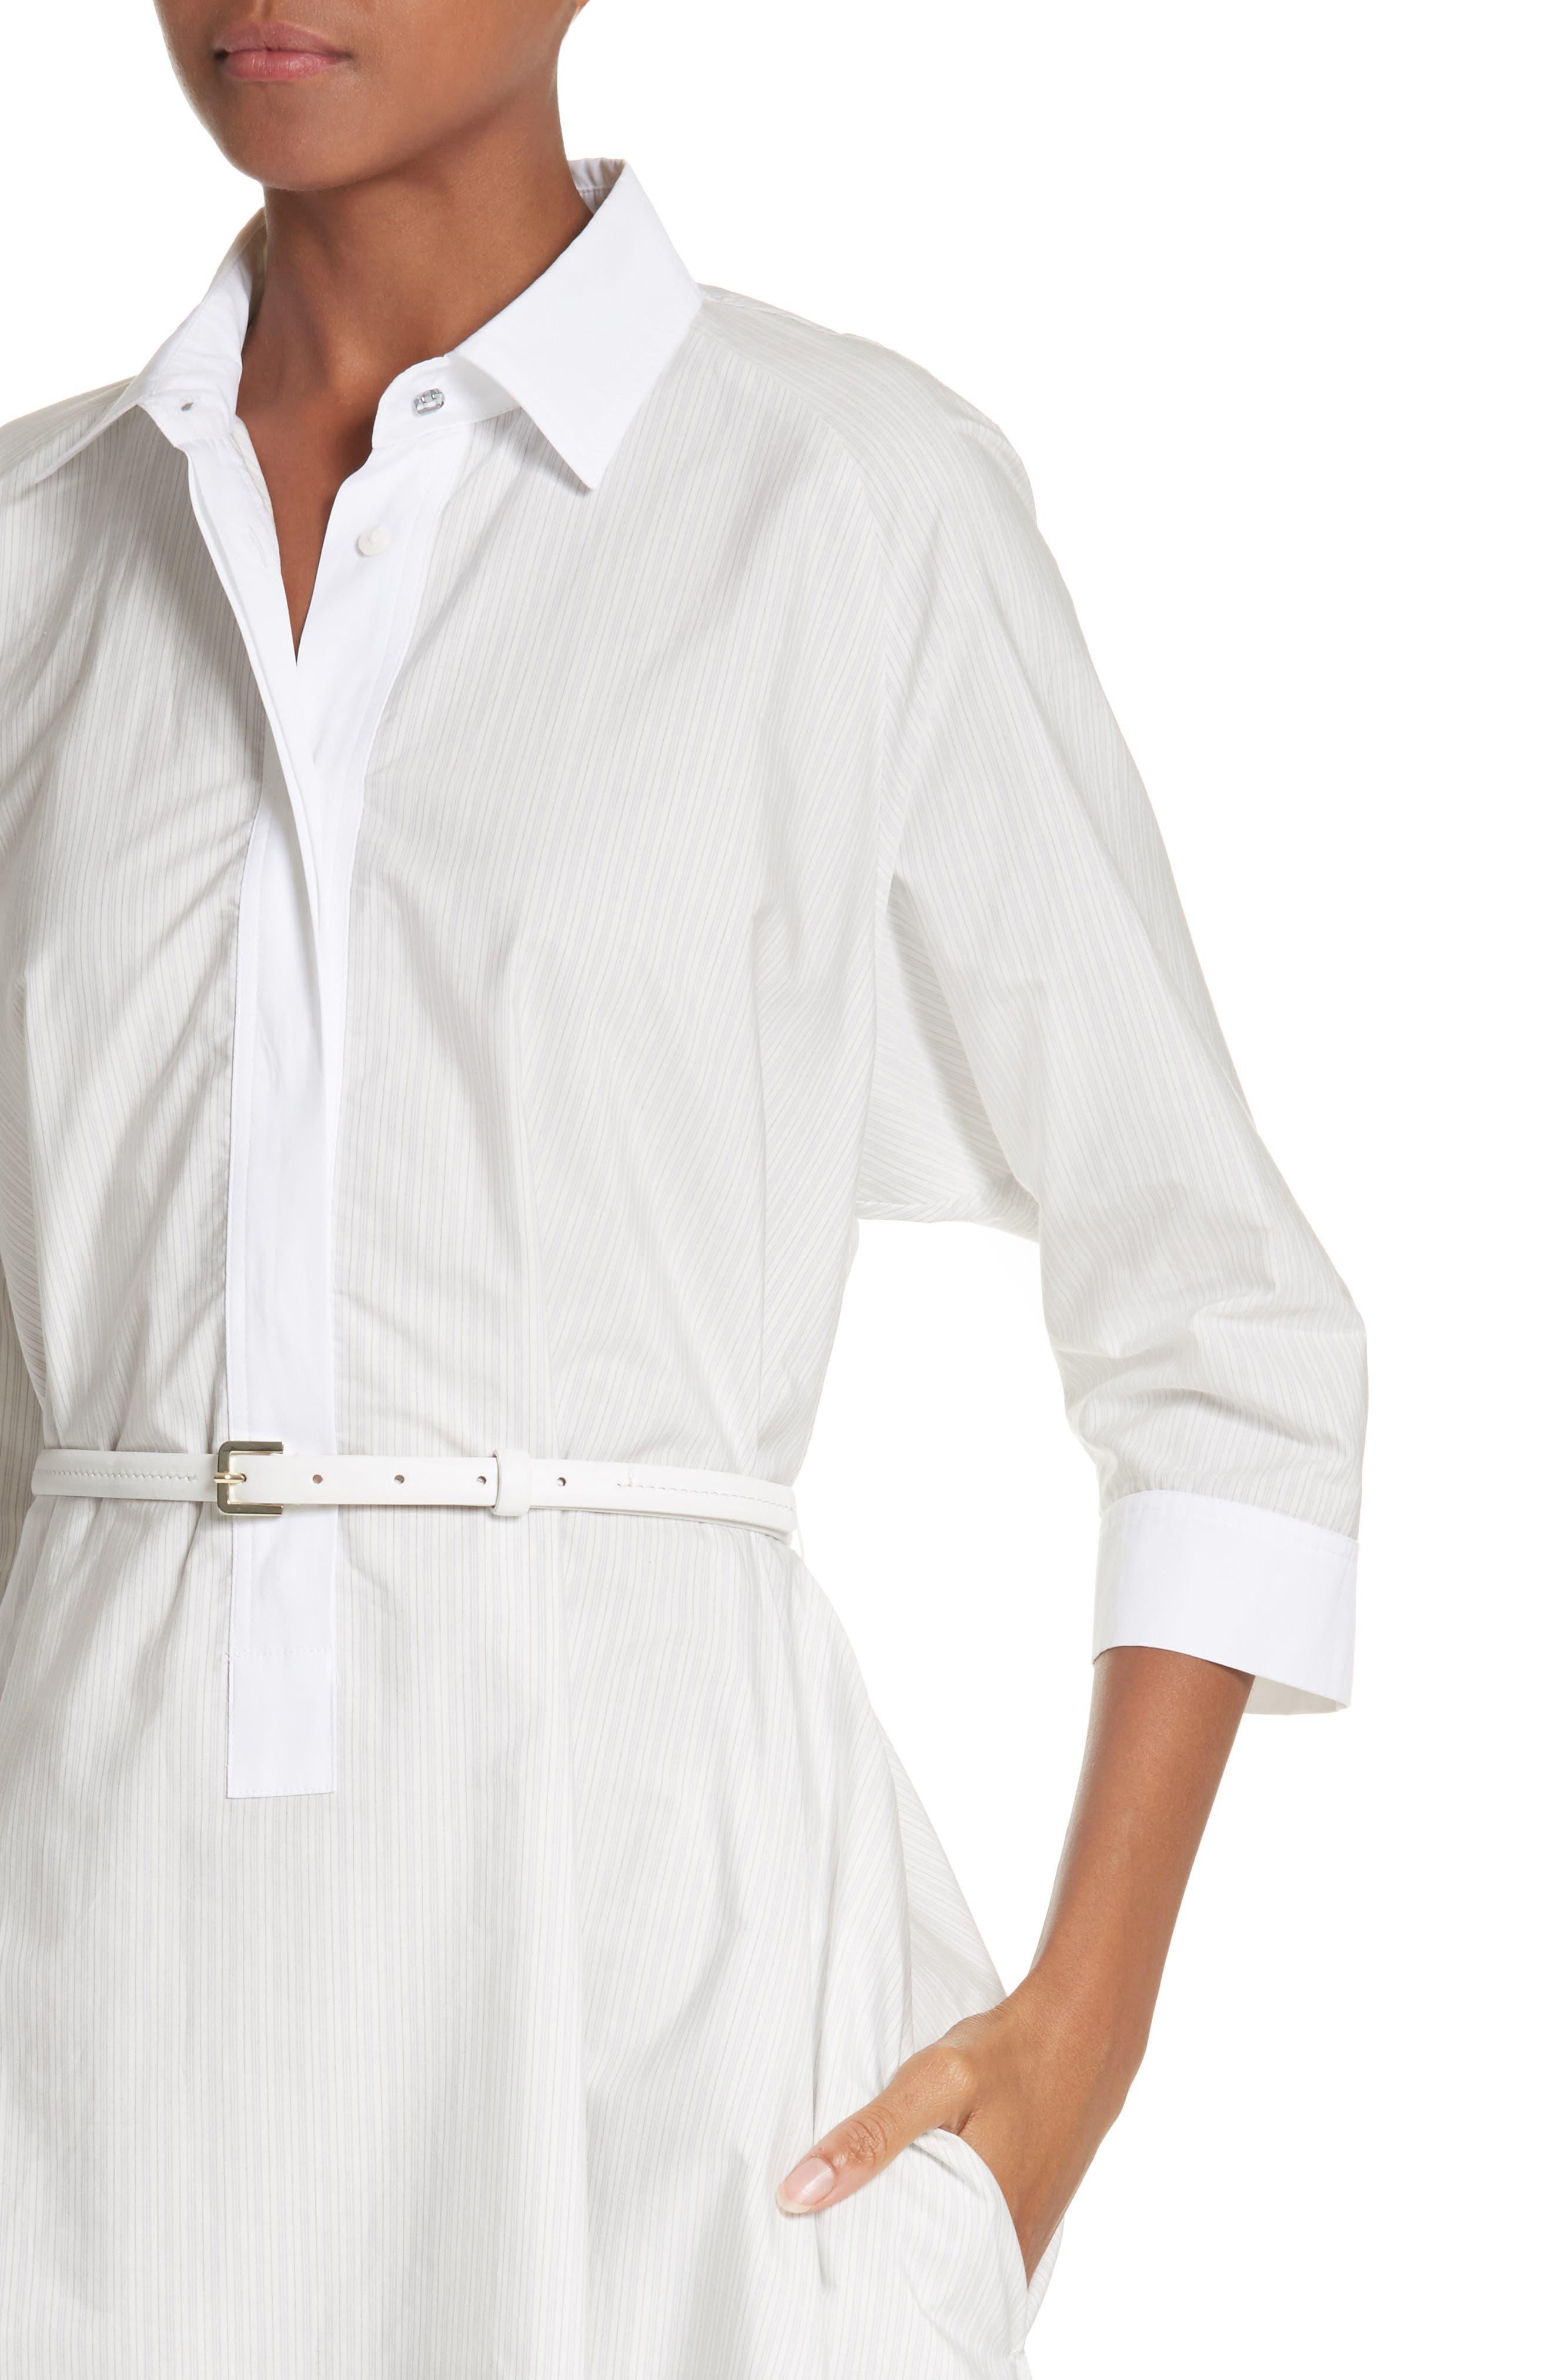 Parola Cotton Shirtdress,                             Alternate thumbnail 4, color,                             Light Grey